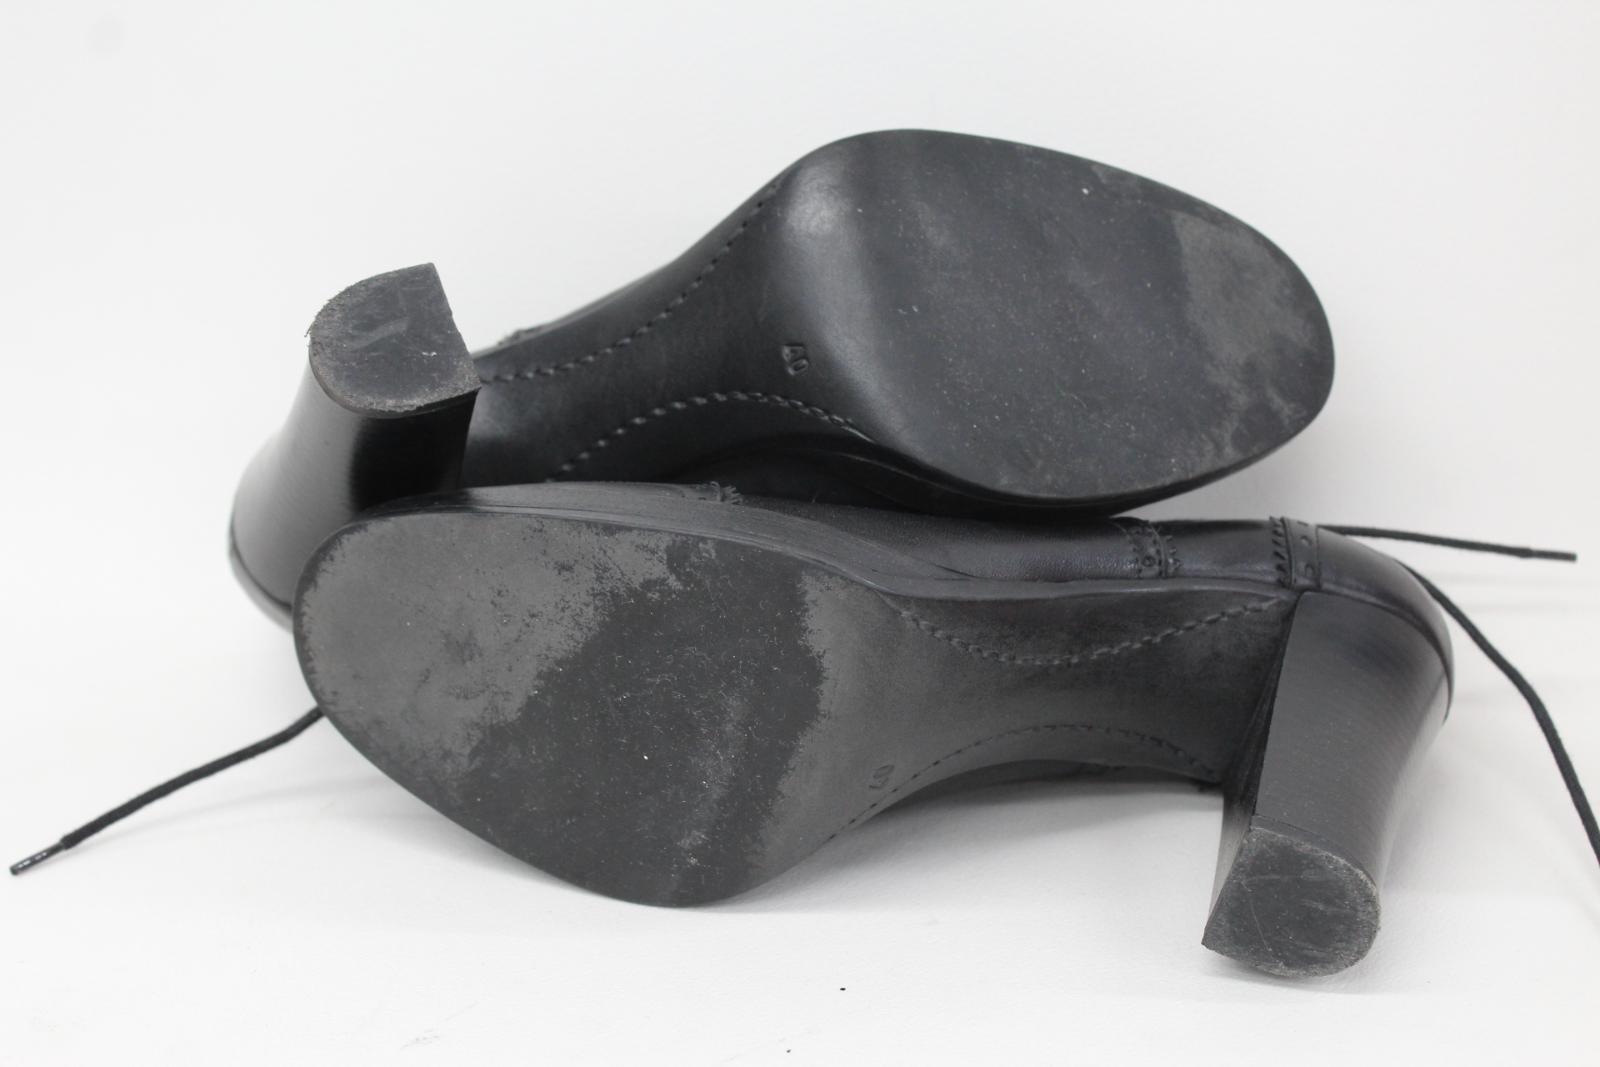 Carvela Damas Brogue De Cuero Negro Estilo Estilo Estilo Alta Zapato De Tacón Alto botas UK7 EU40 b60a96